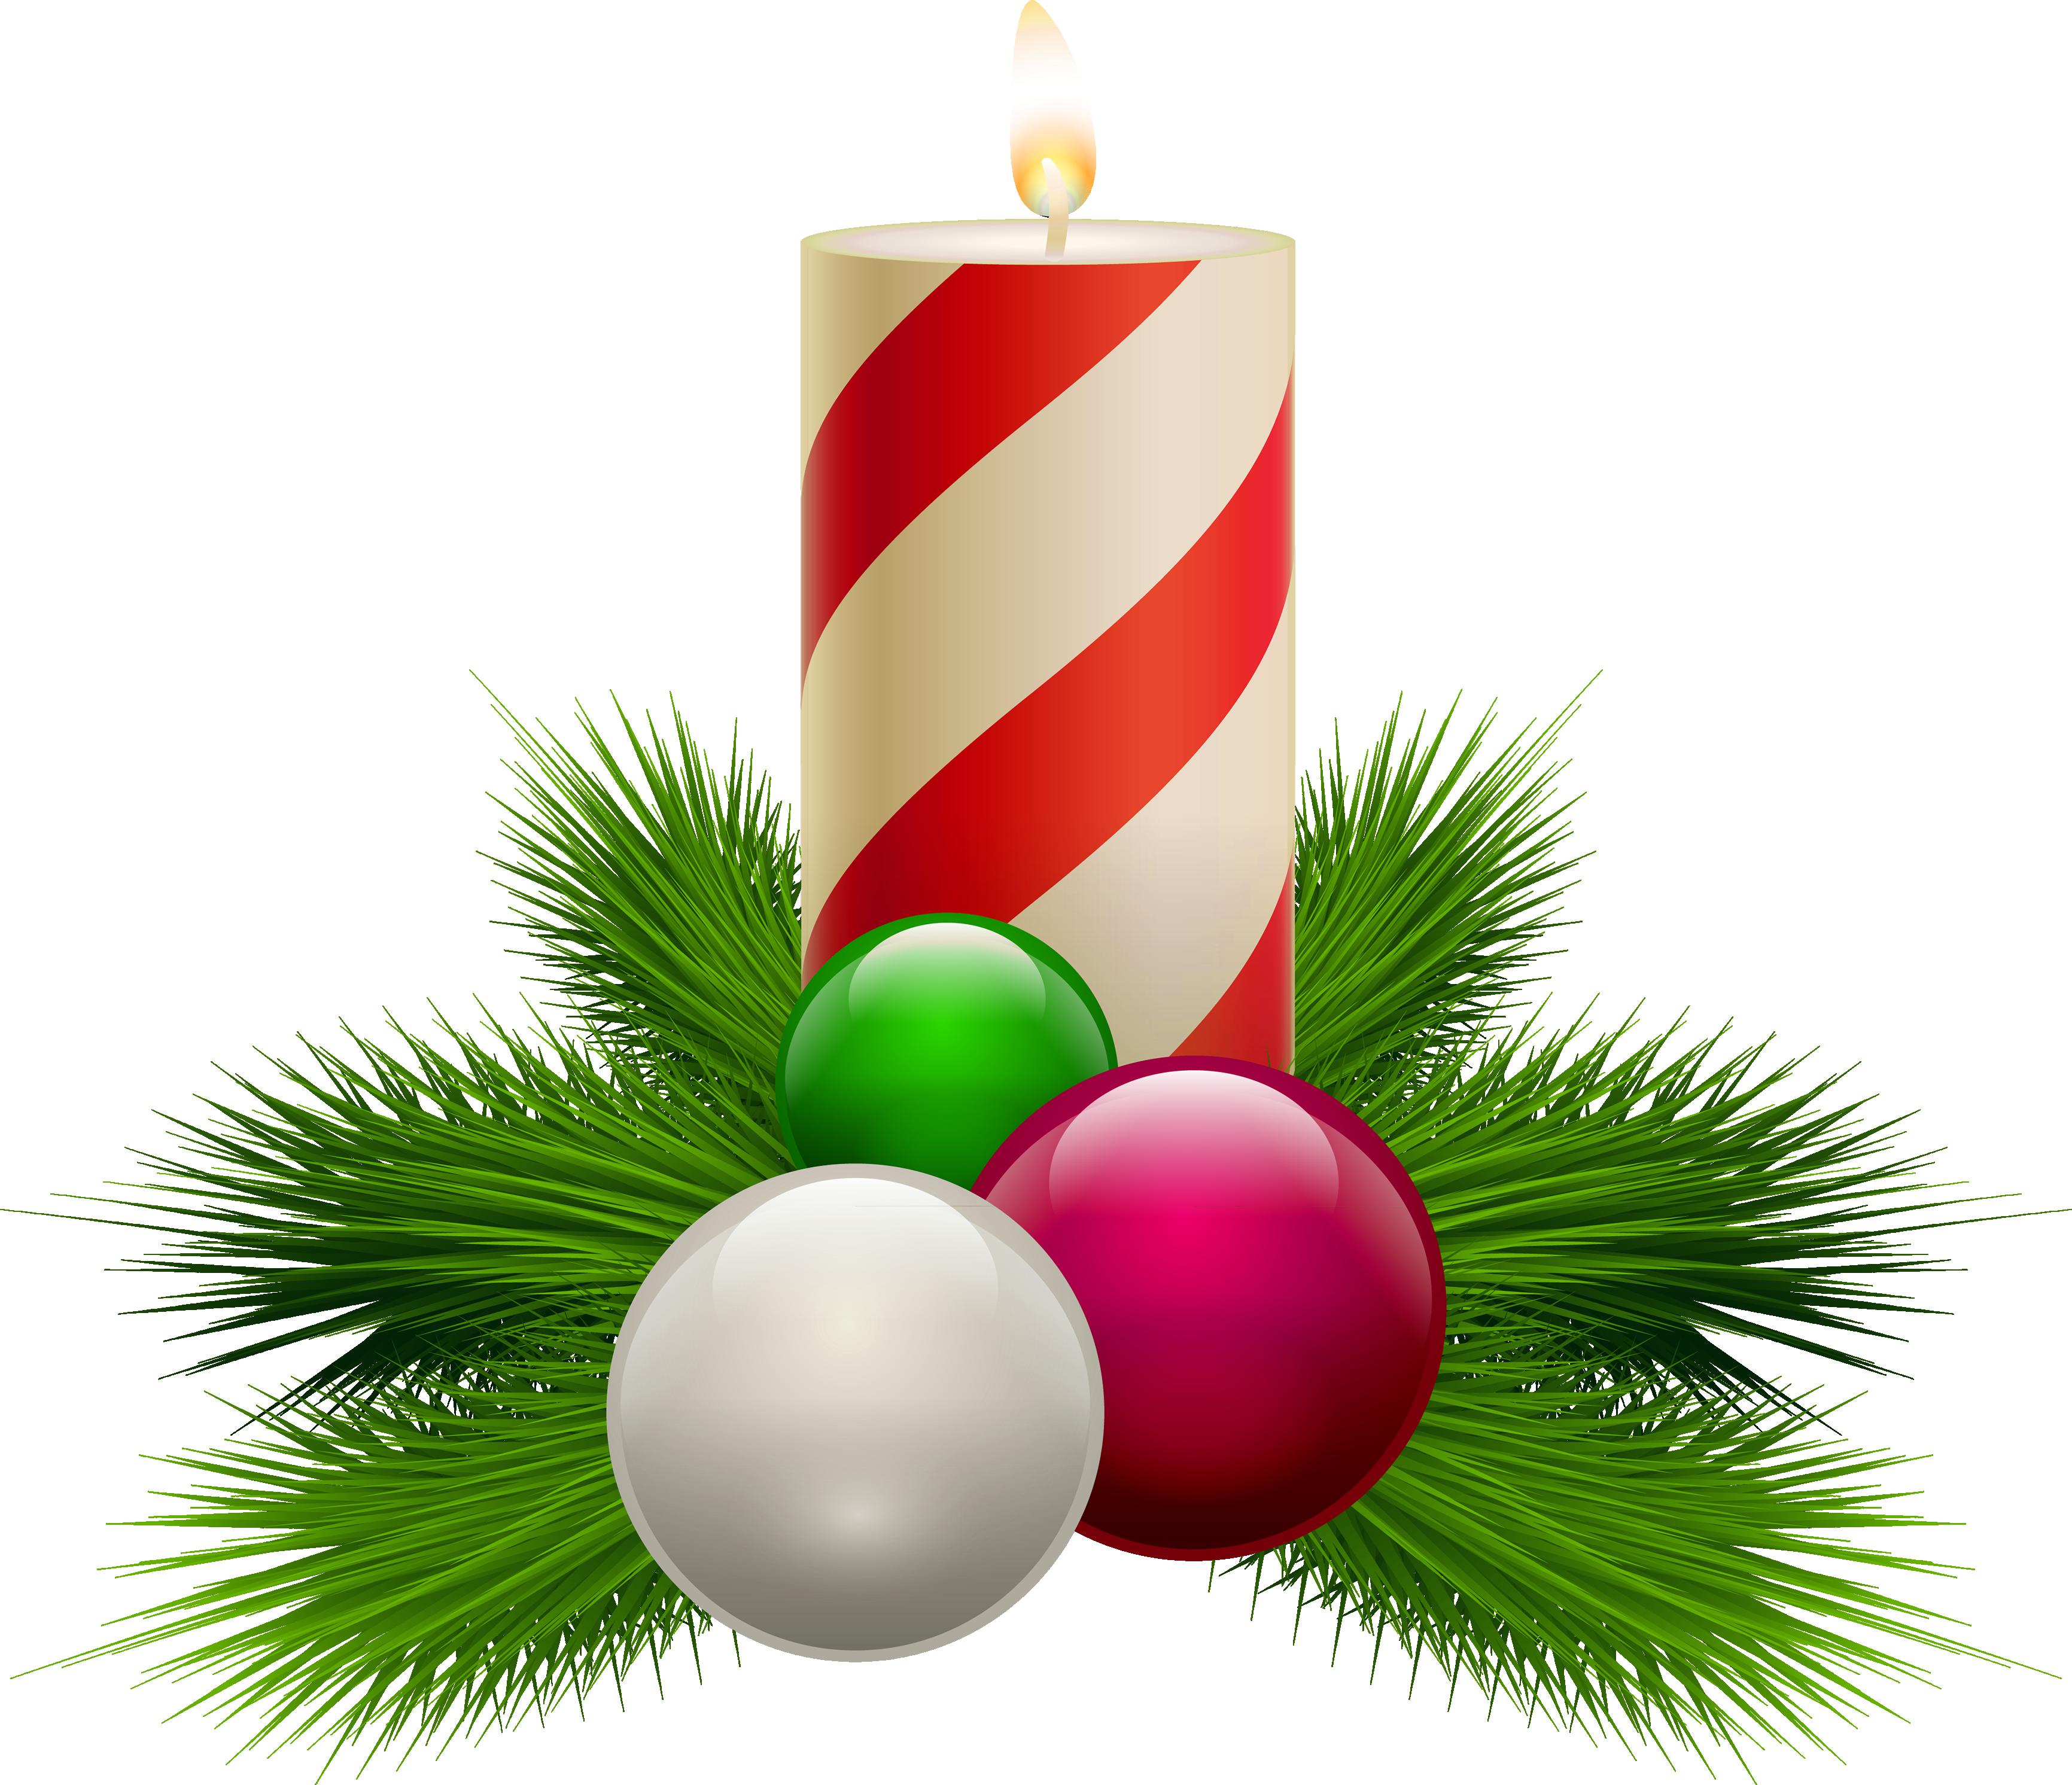 Christmas candle PNG image